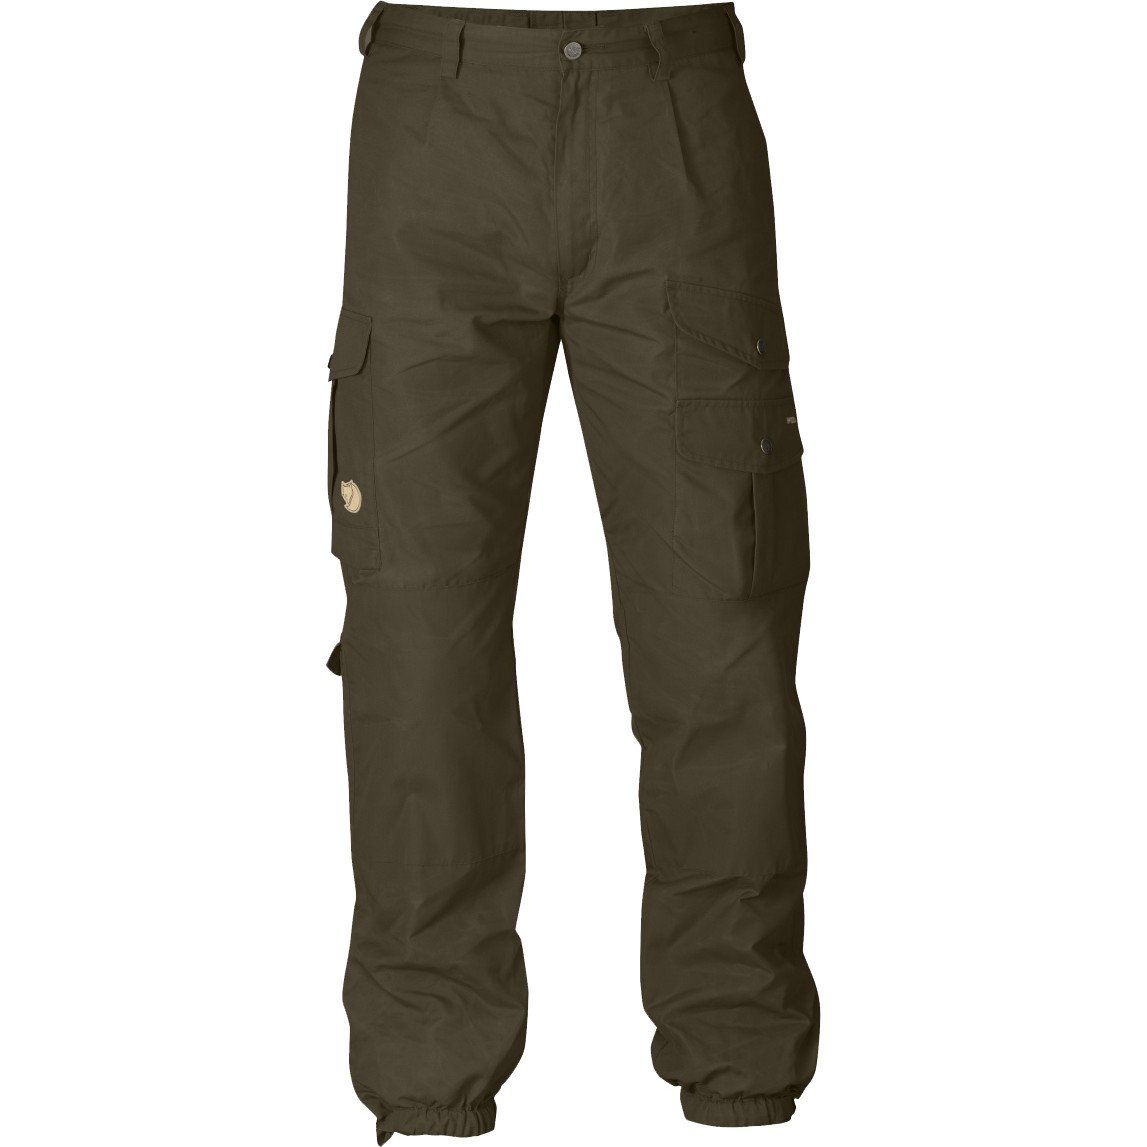 Fj?llr?ven Greenlamd Men's Outdoor Trousers